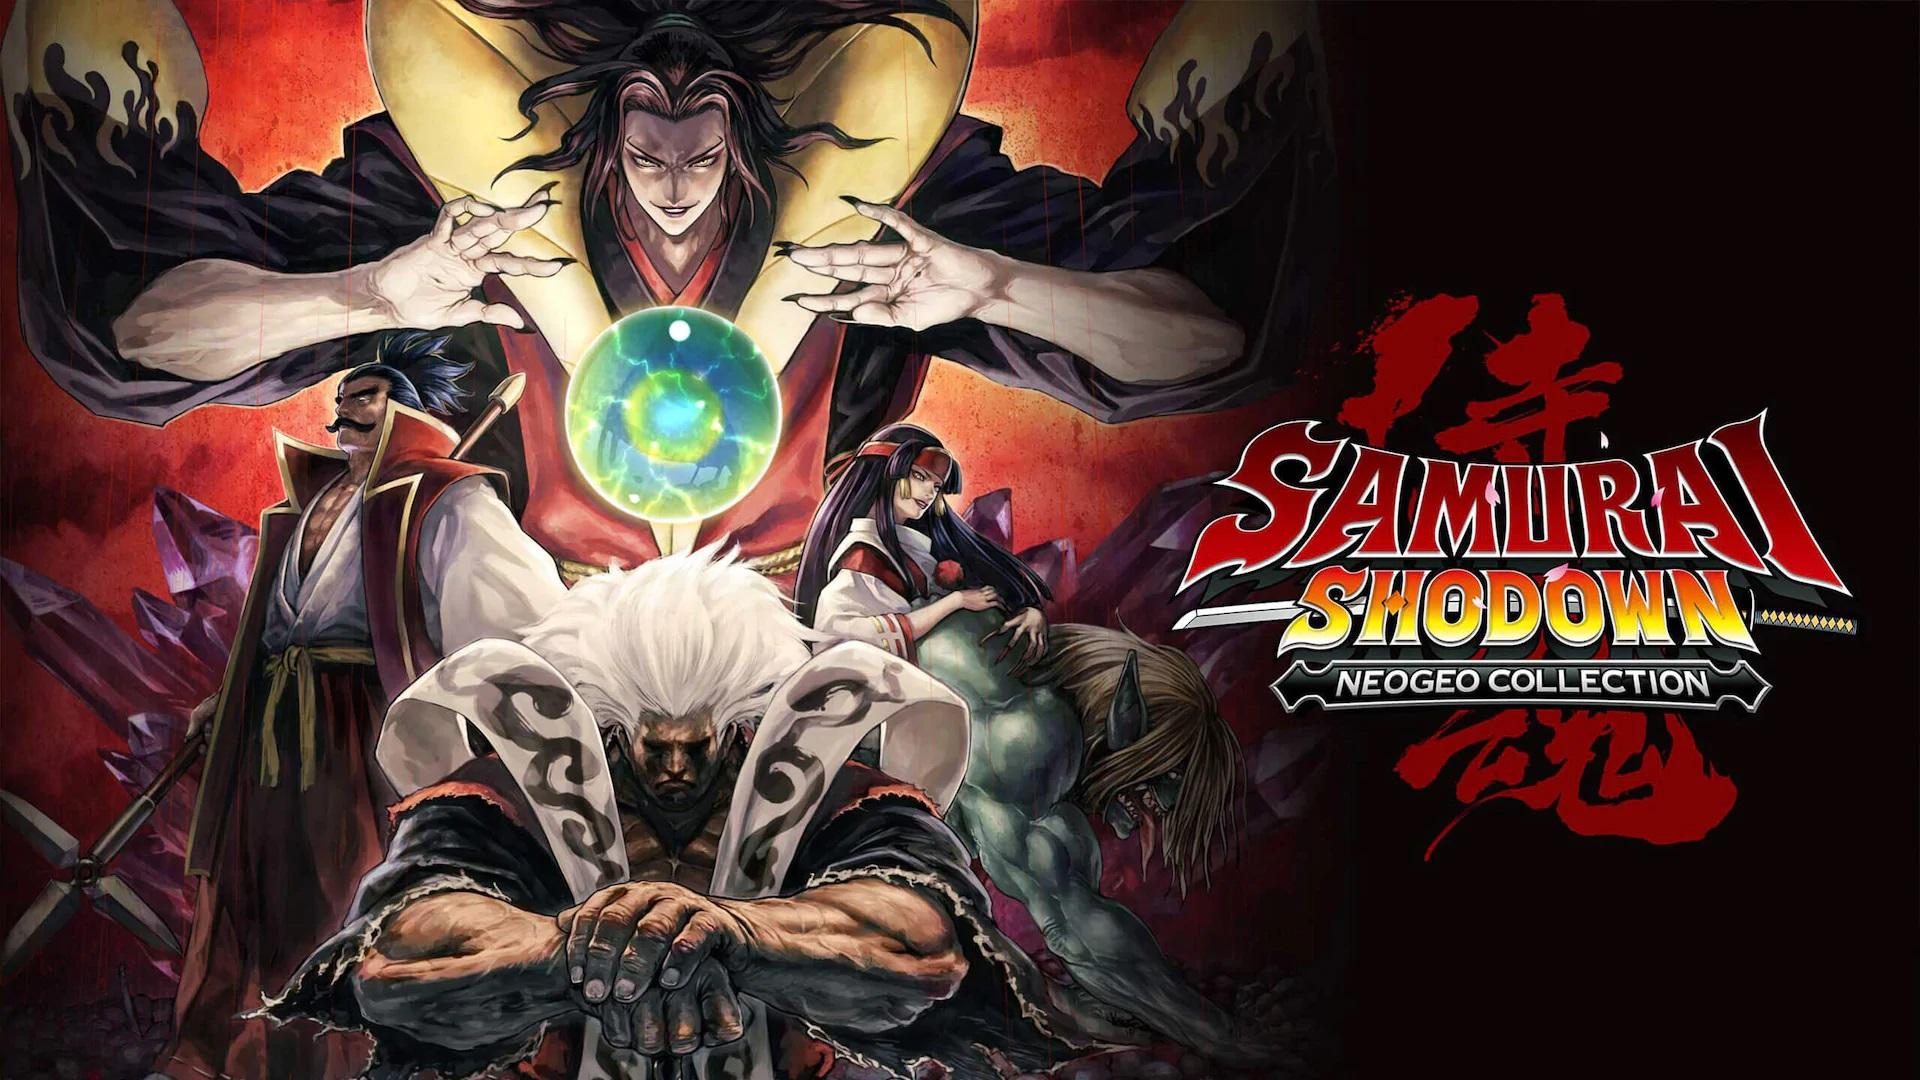 Samurai-Shodown-NeoGeo-Collection-ucretsiz-oldu.jpg